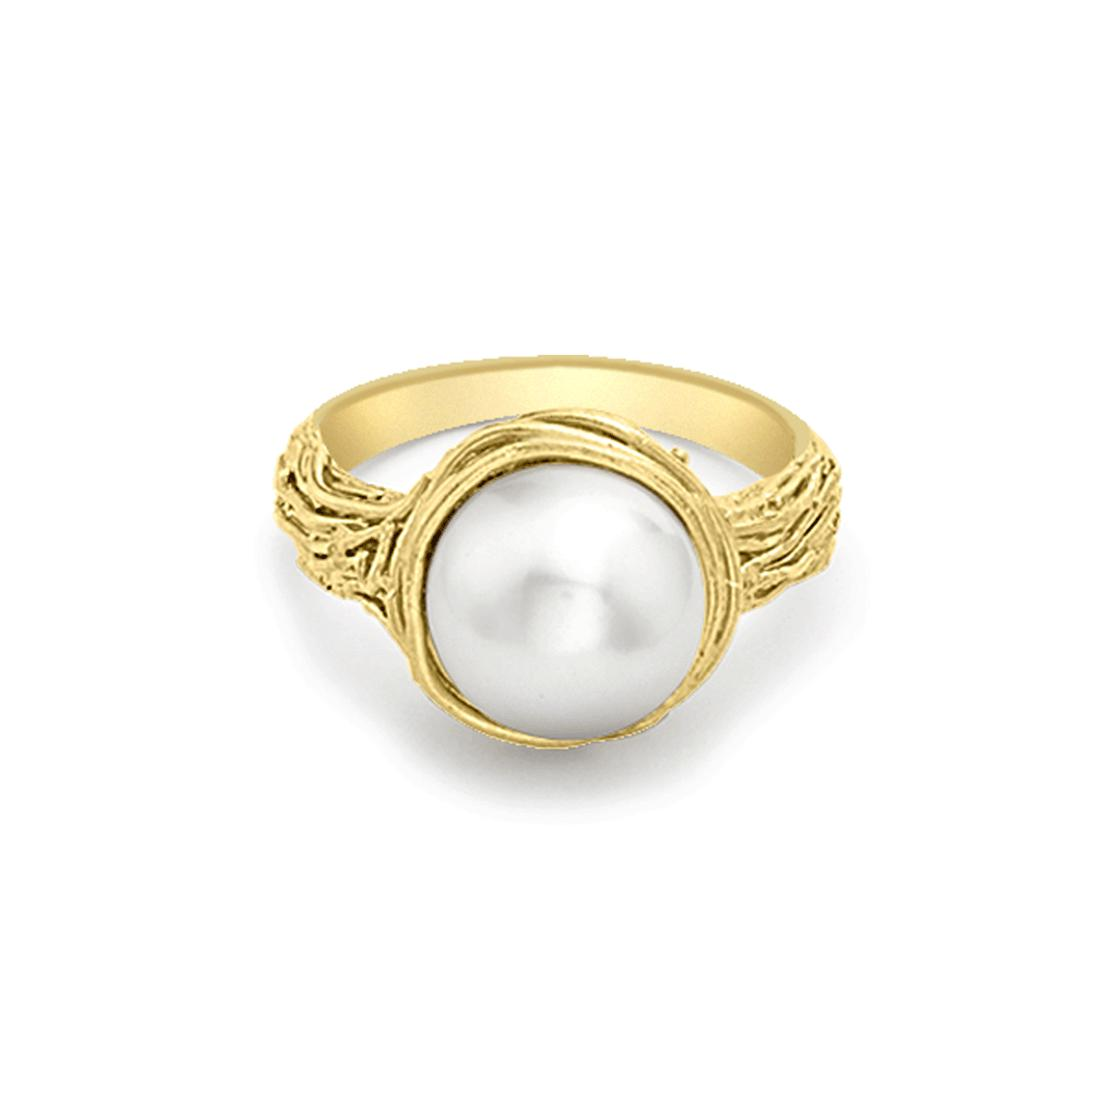 London Road Jewellery Burlington Yellow Gold Pearl Ring - UK L - US 5 1/2 - EU 51 3/4 aJVEis4